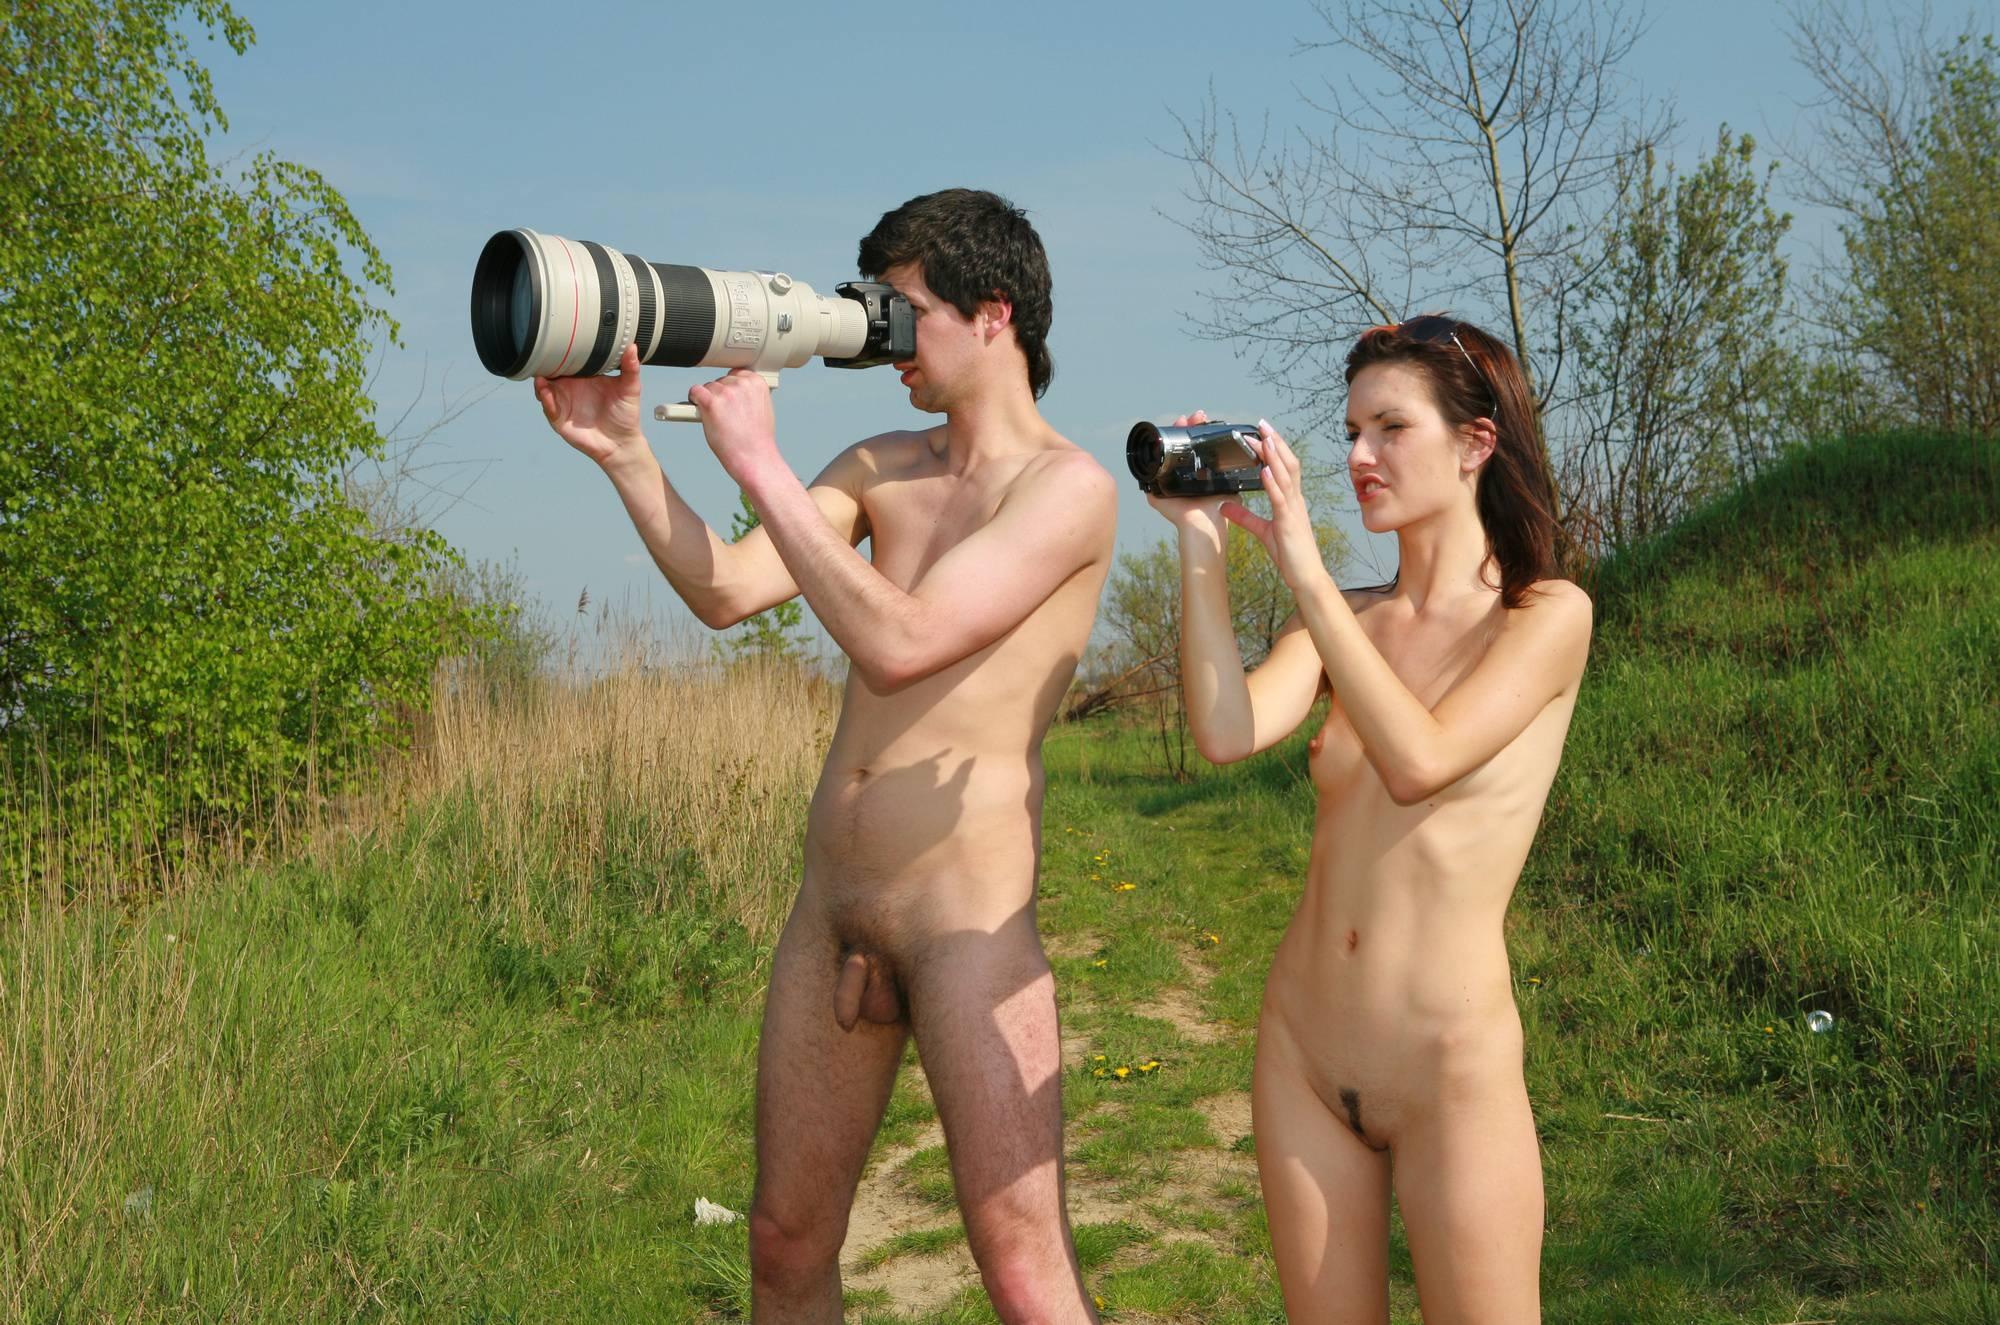 Lake Brzegi Our Cameras - 1